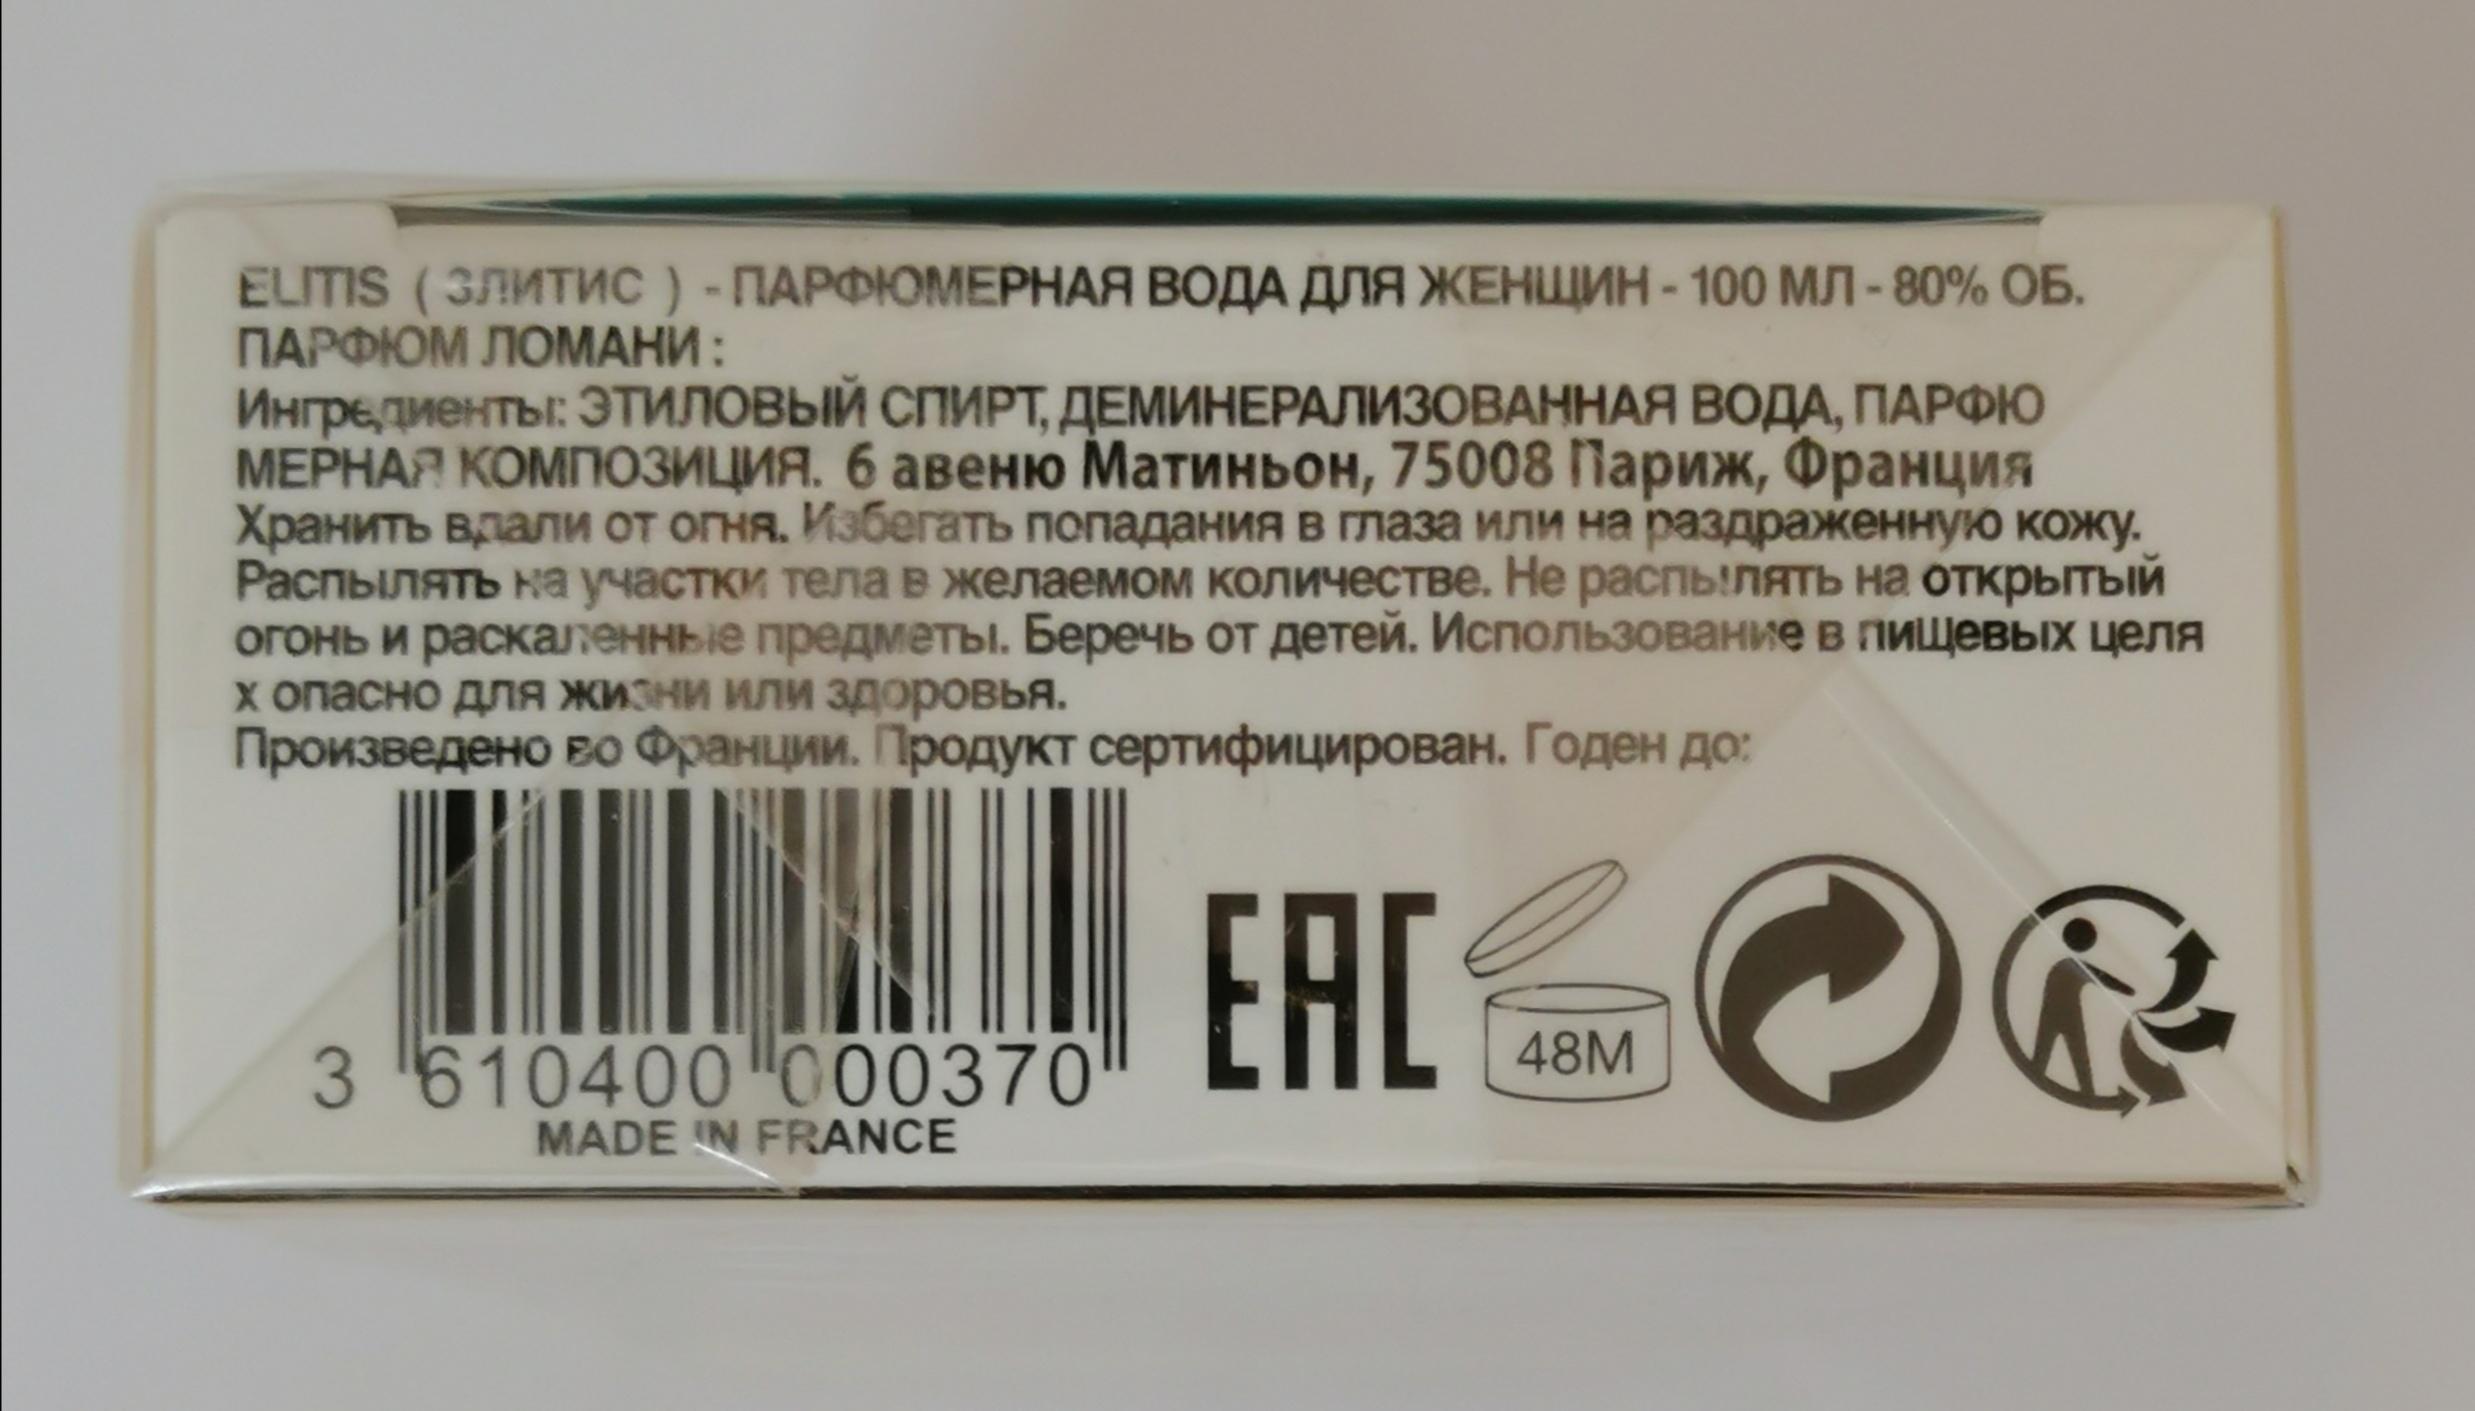 Туалетная вода 100 мл Lomani Elitis - фото штрих-кода на коробке